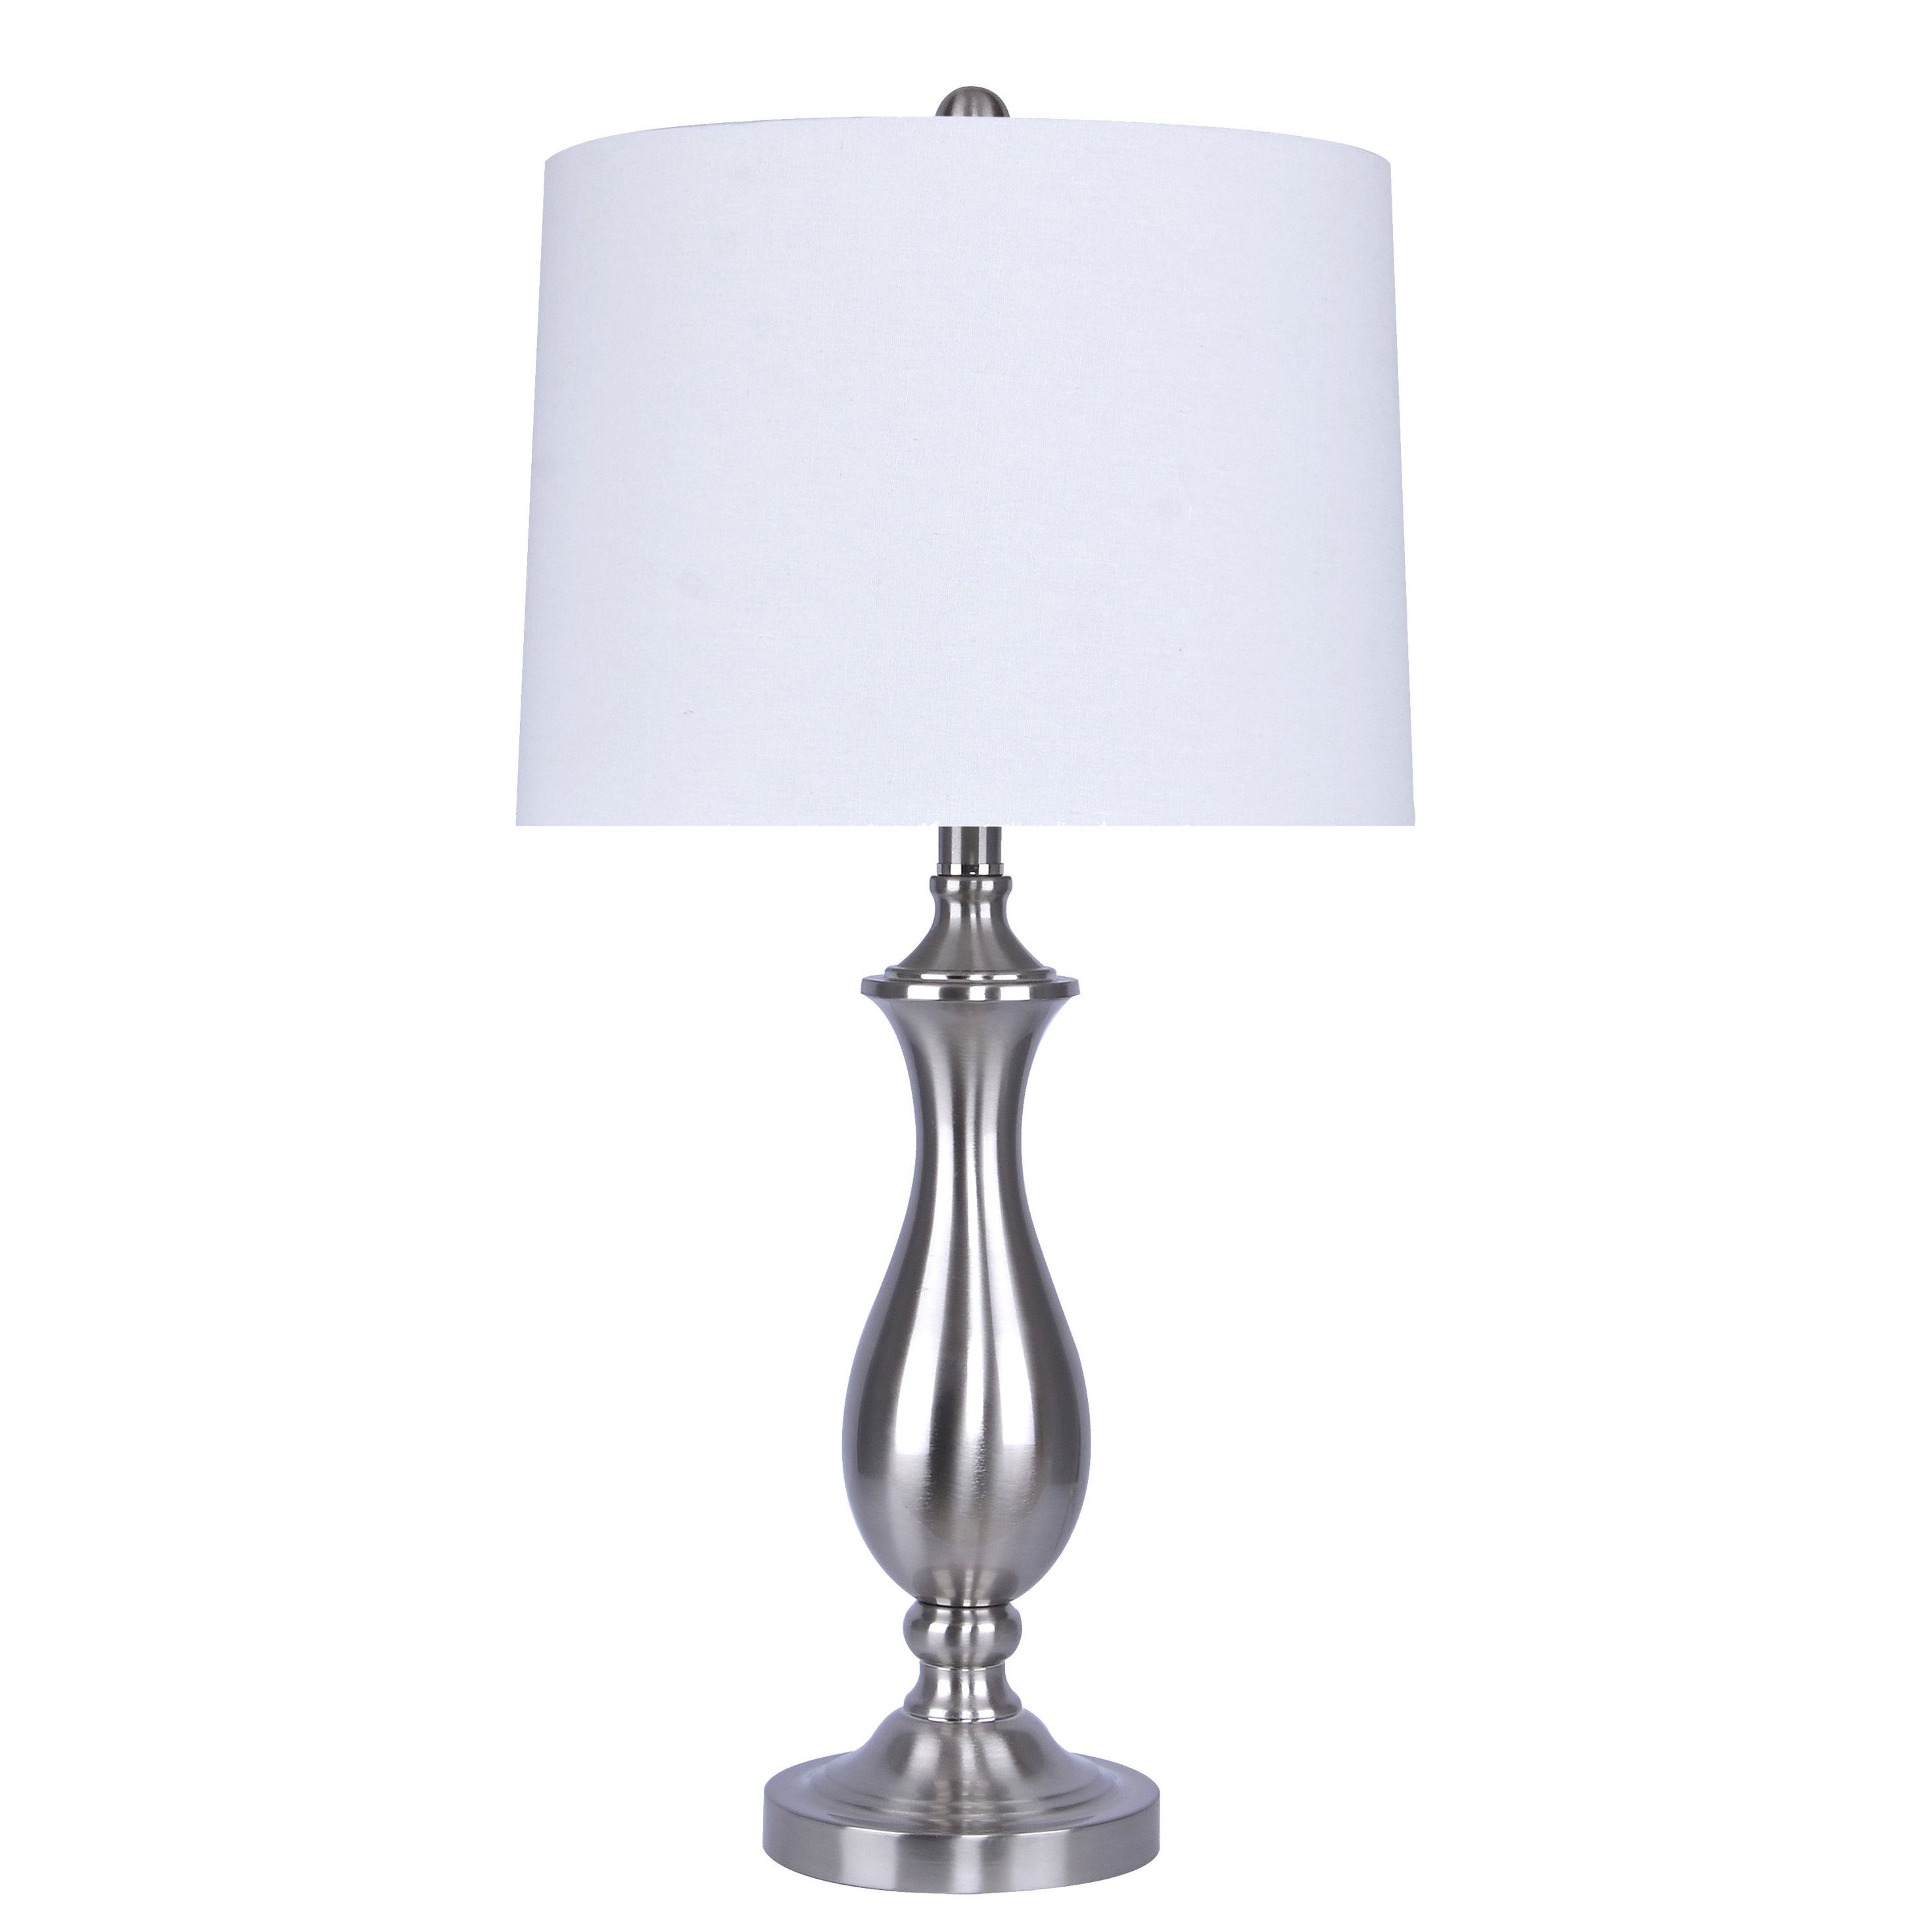 Vanhorn 28 Table Lamp Nickel Table Lamps Table Lamp Lamp